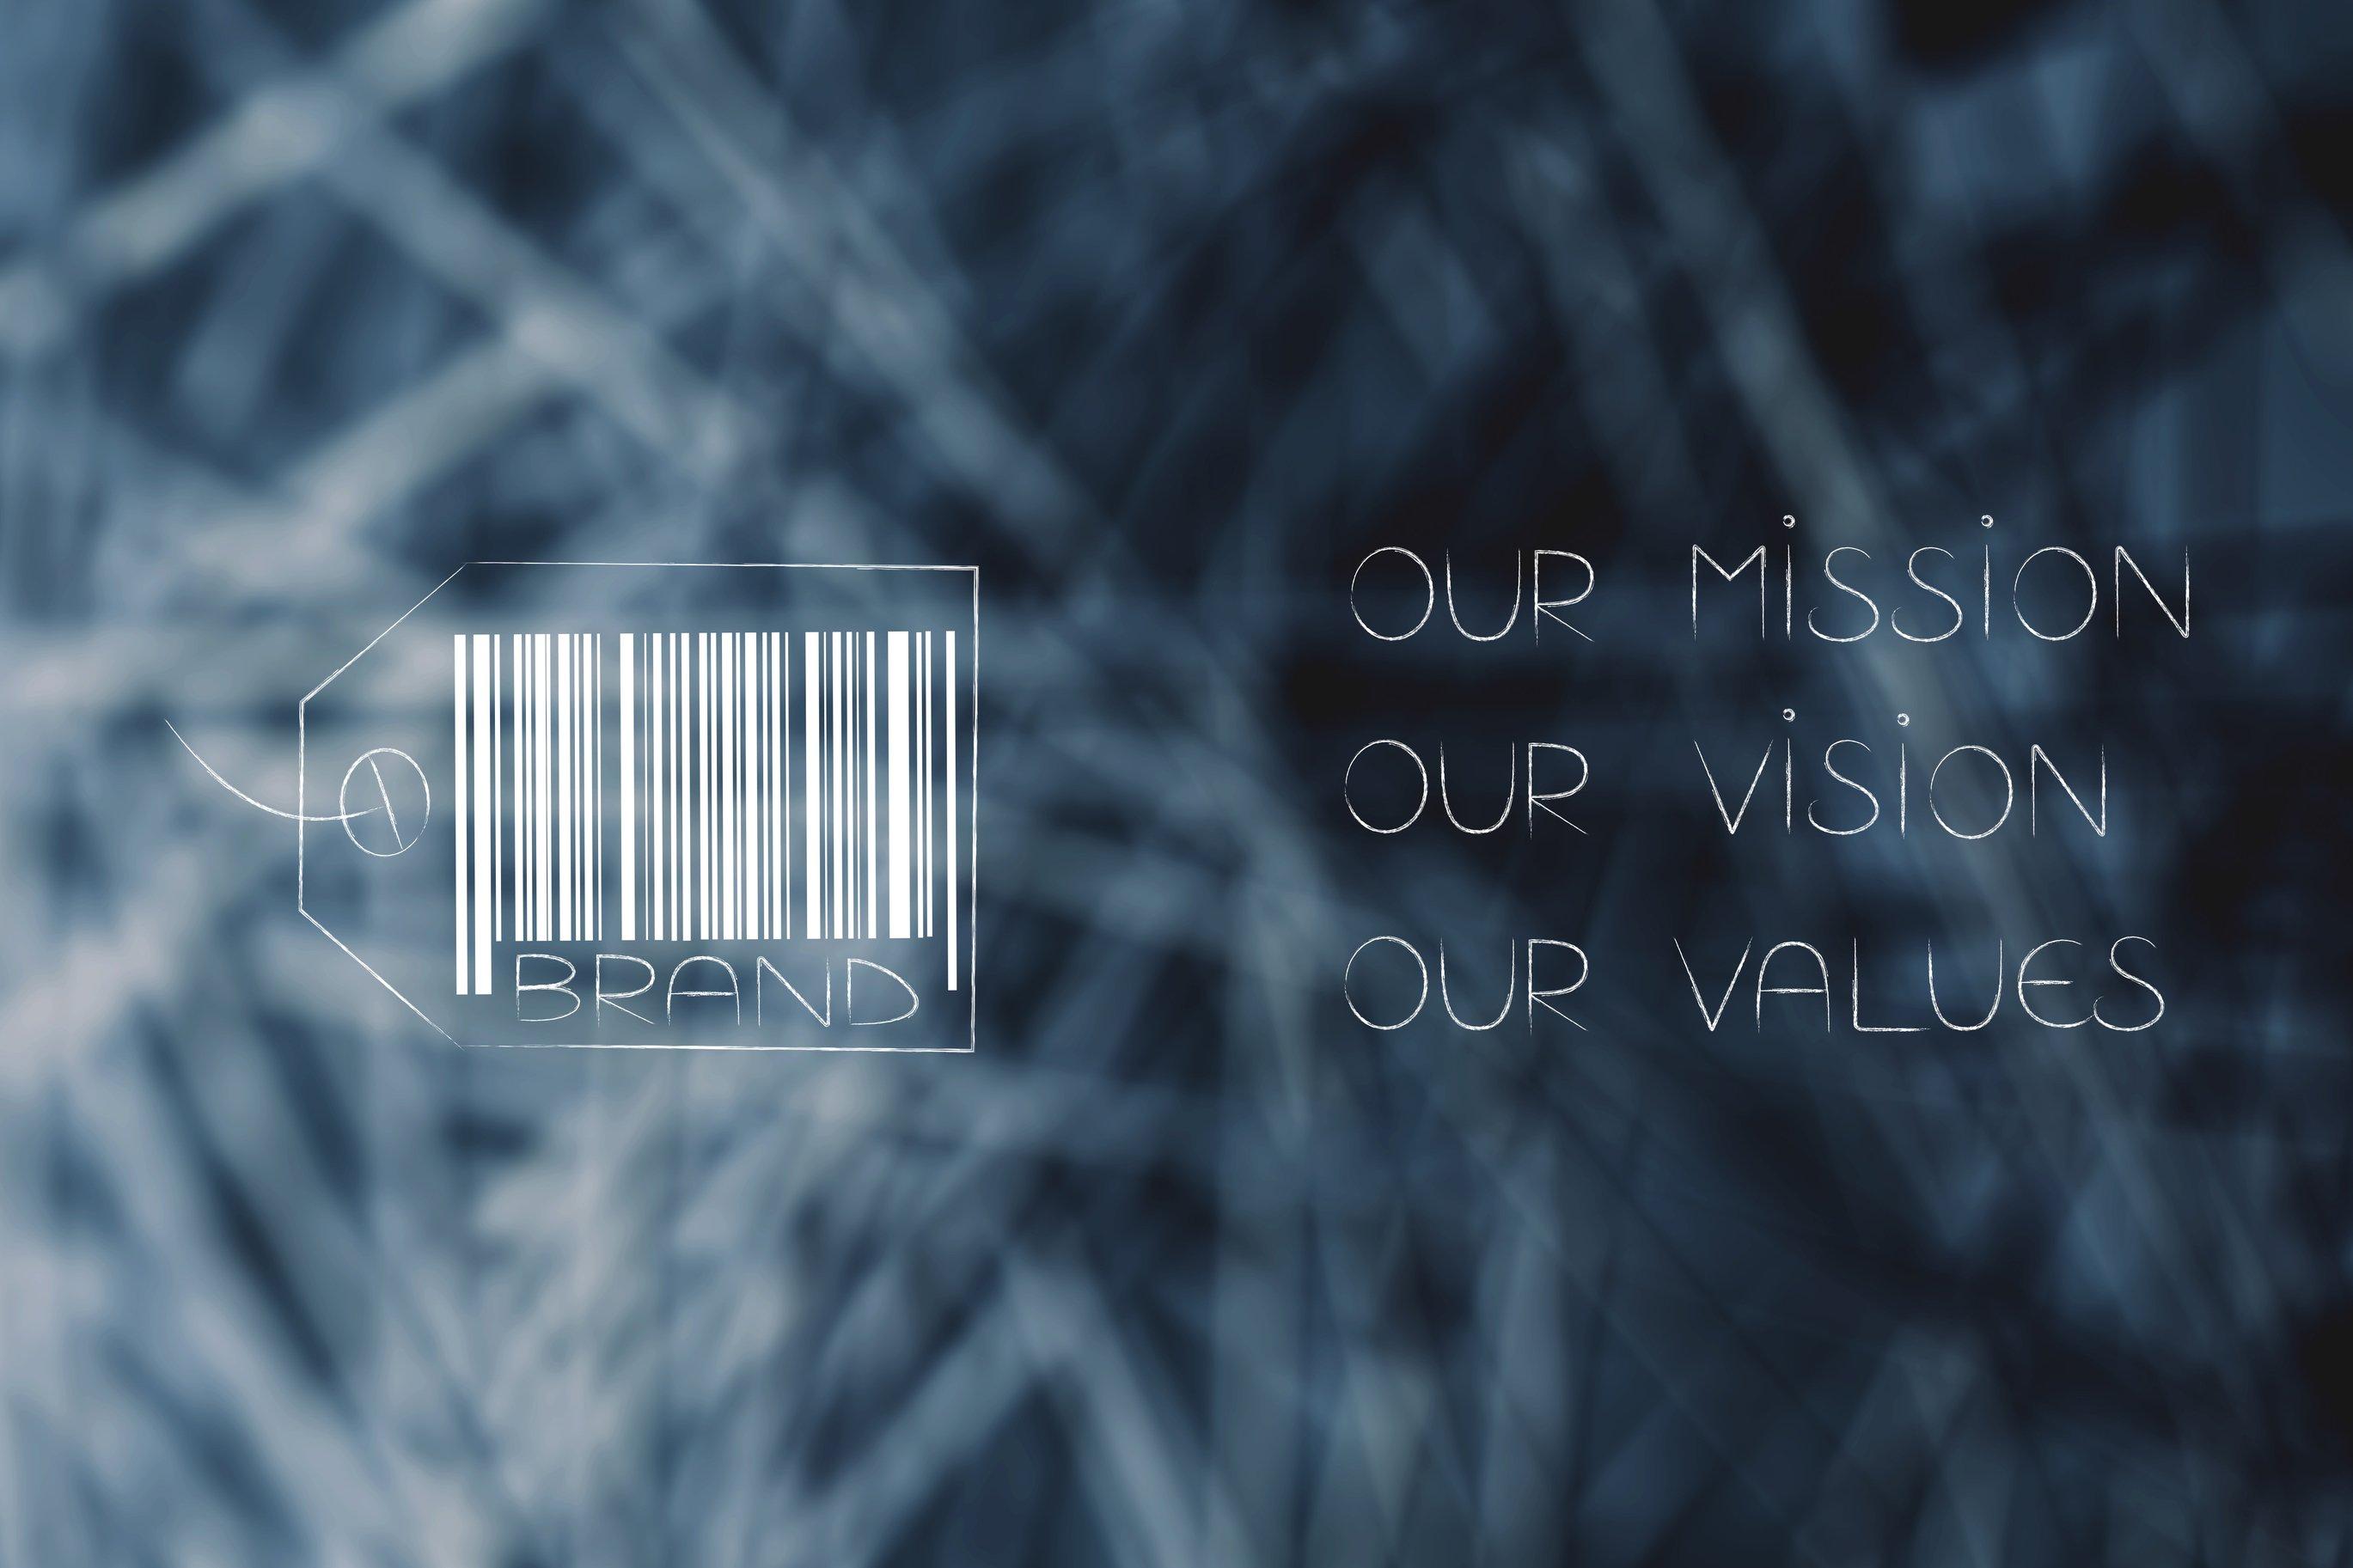 dreamstime_l_Our Mission, Our Vision, Our Values